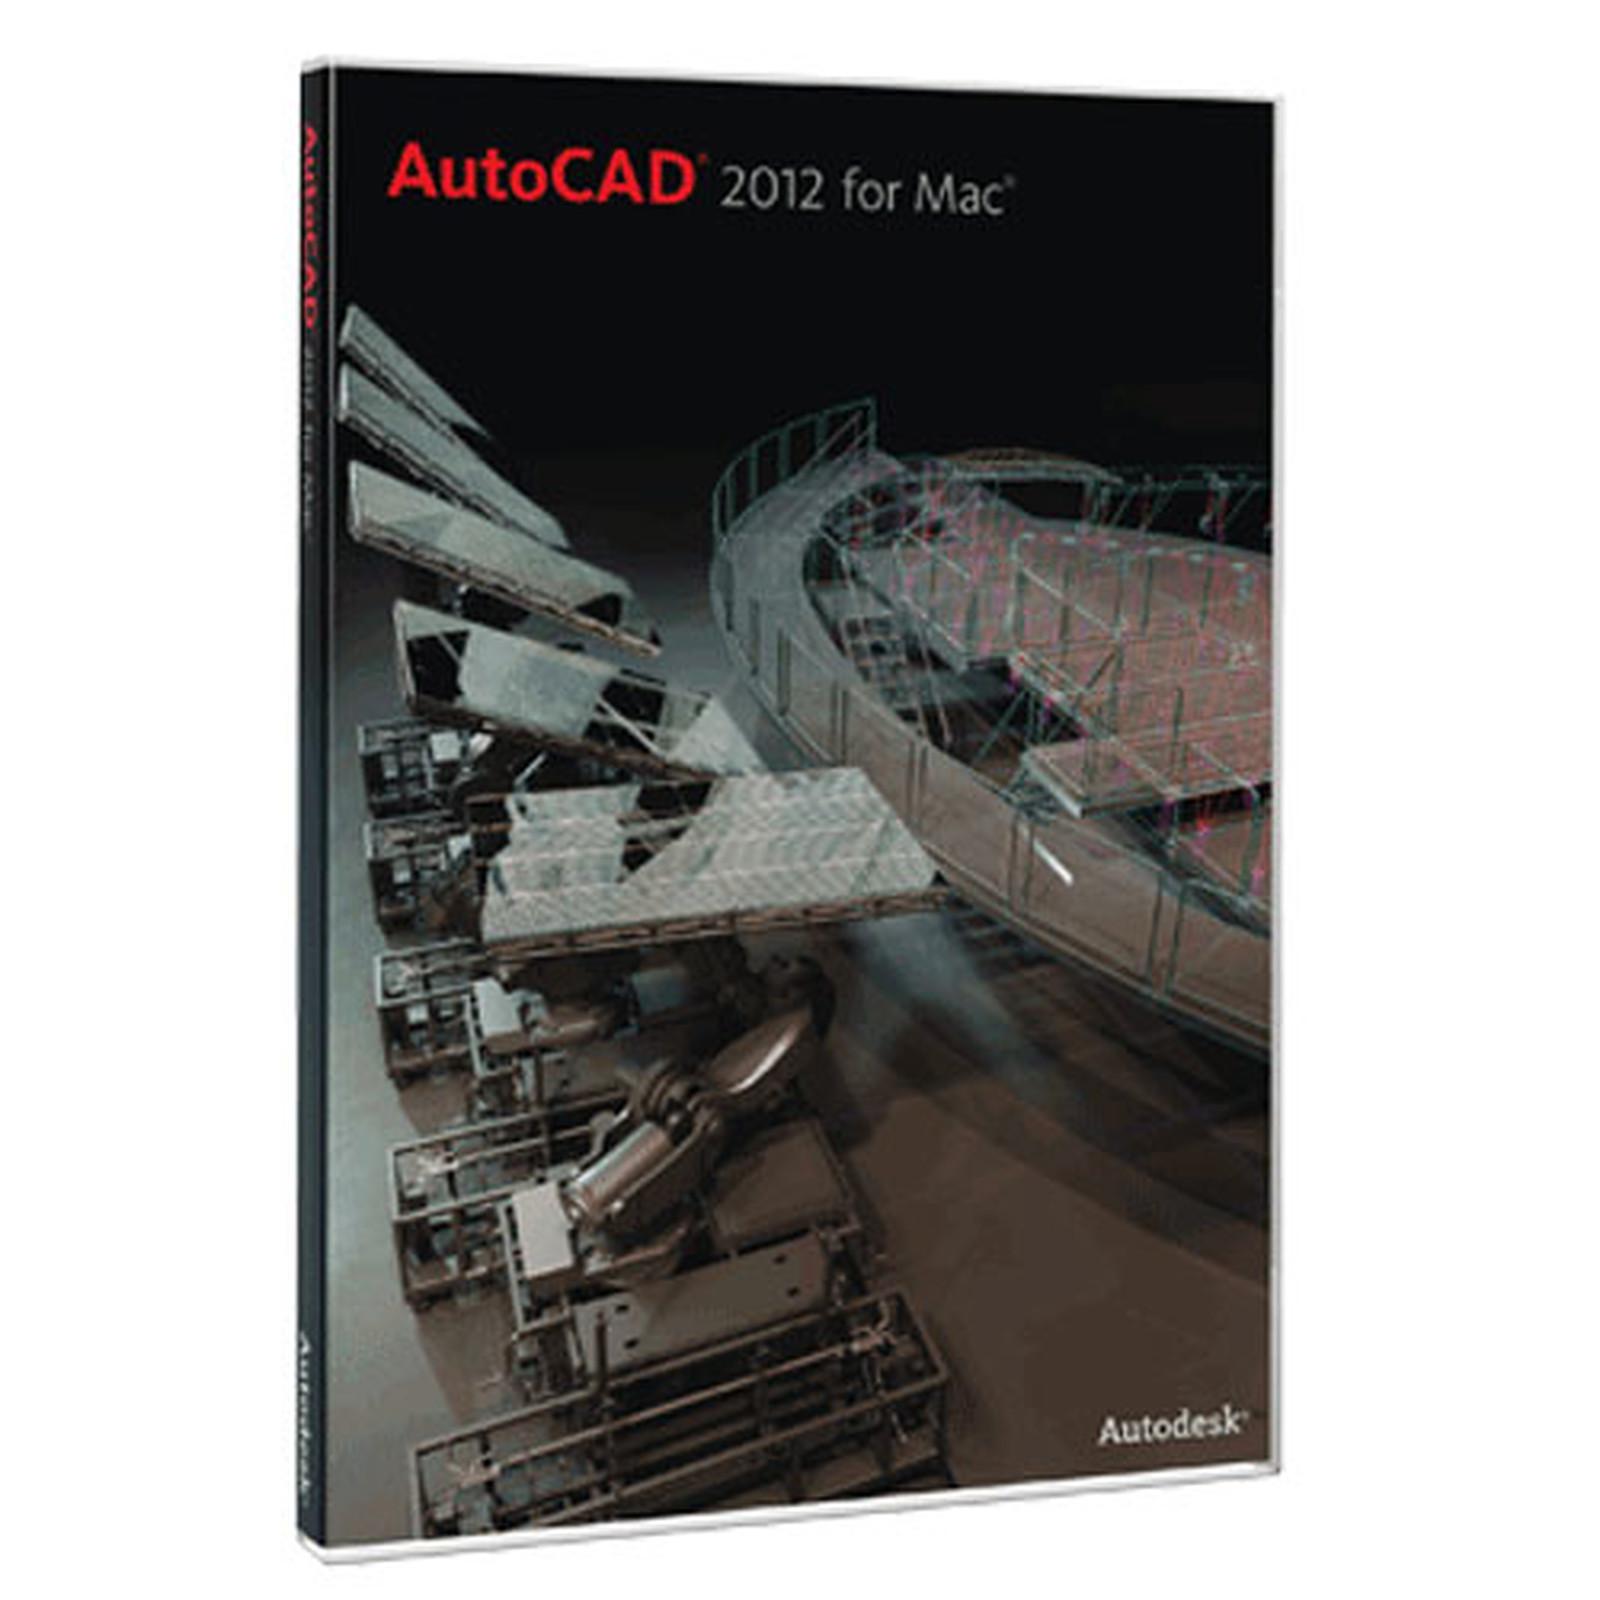 Autodesk Autocad 2012 For Mac